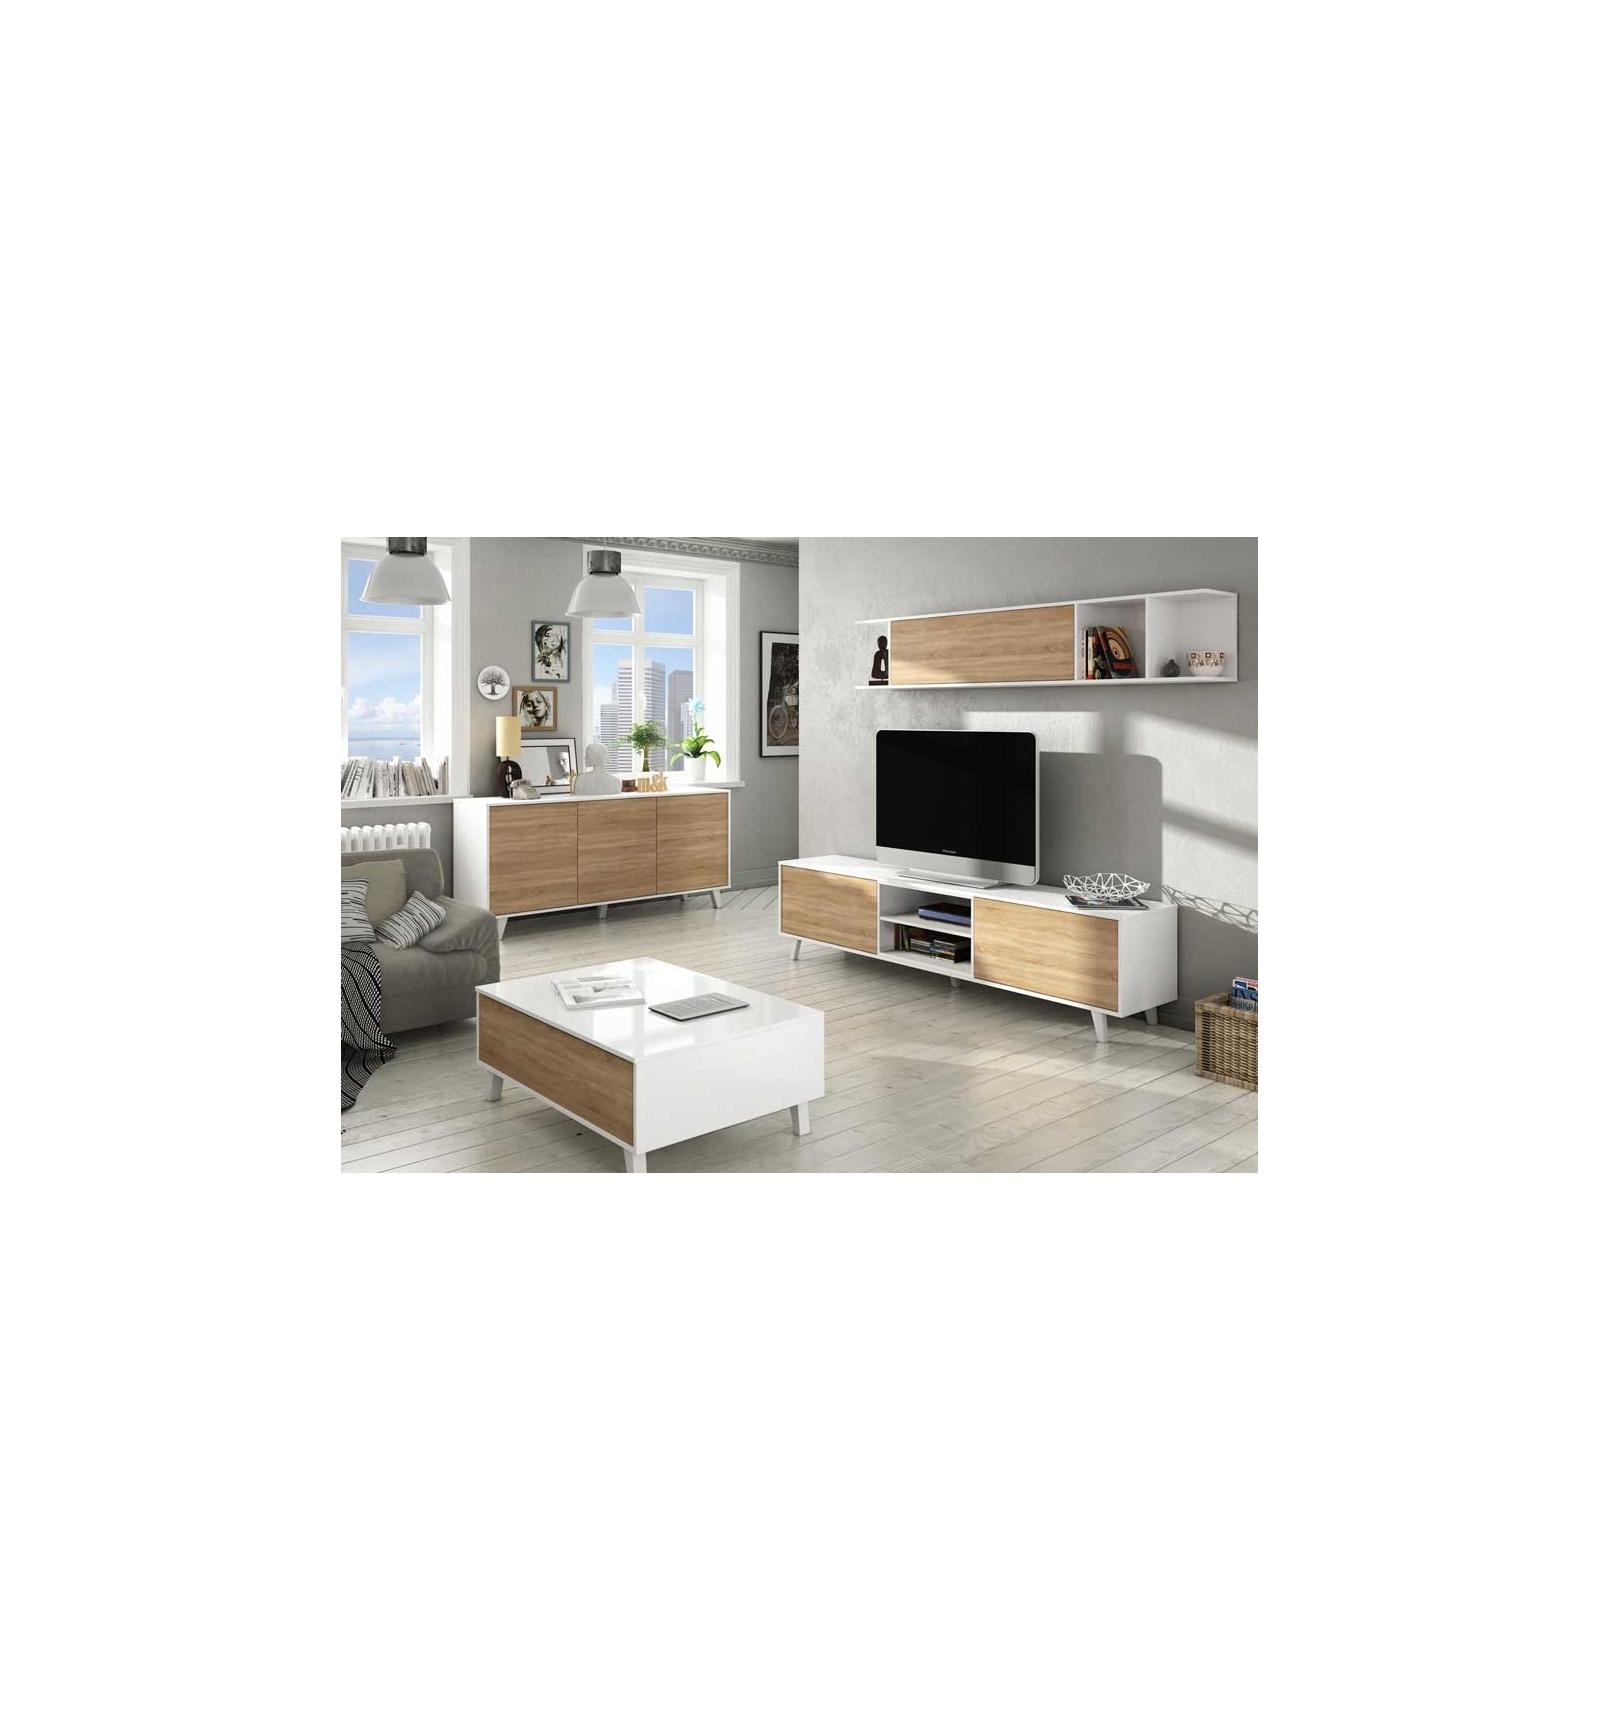 Tv Möbel Im Nordic Style Emori